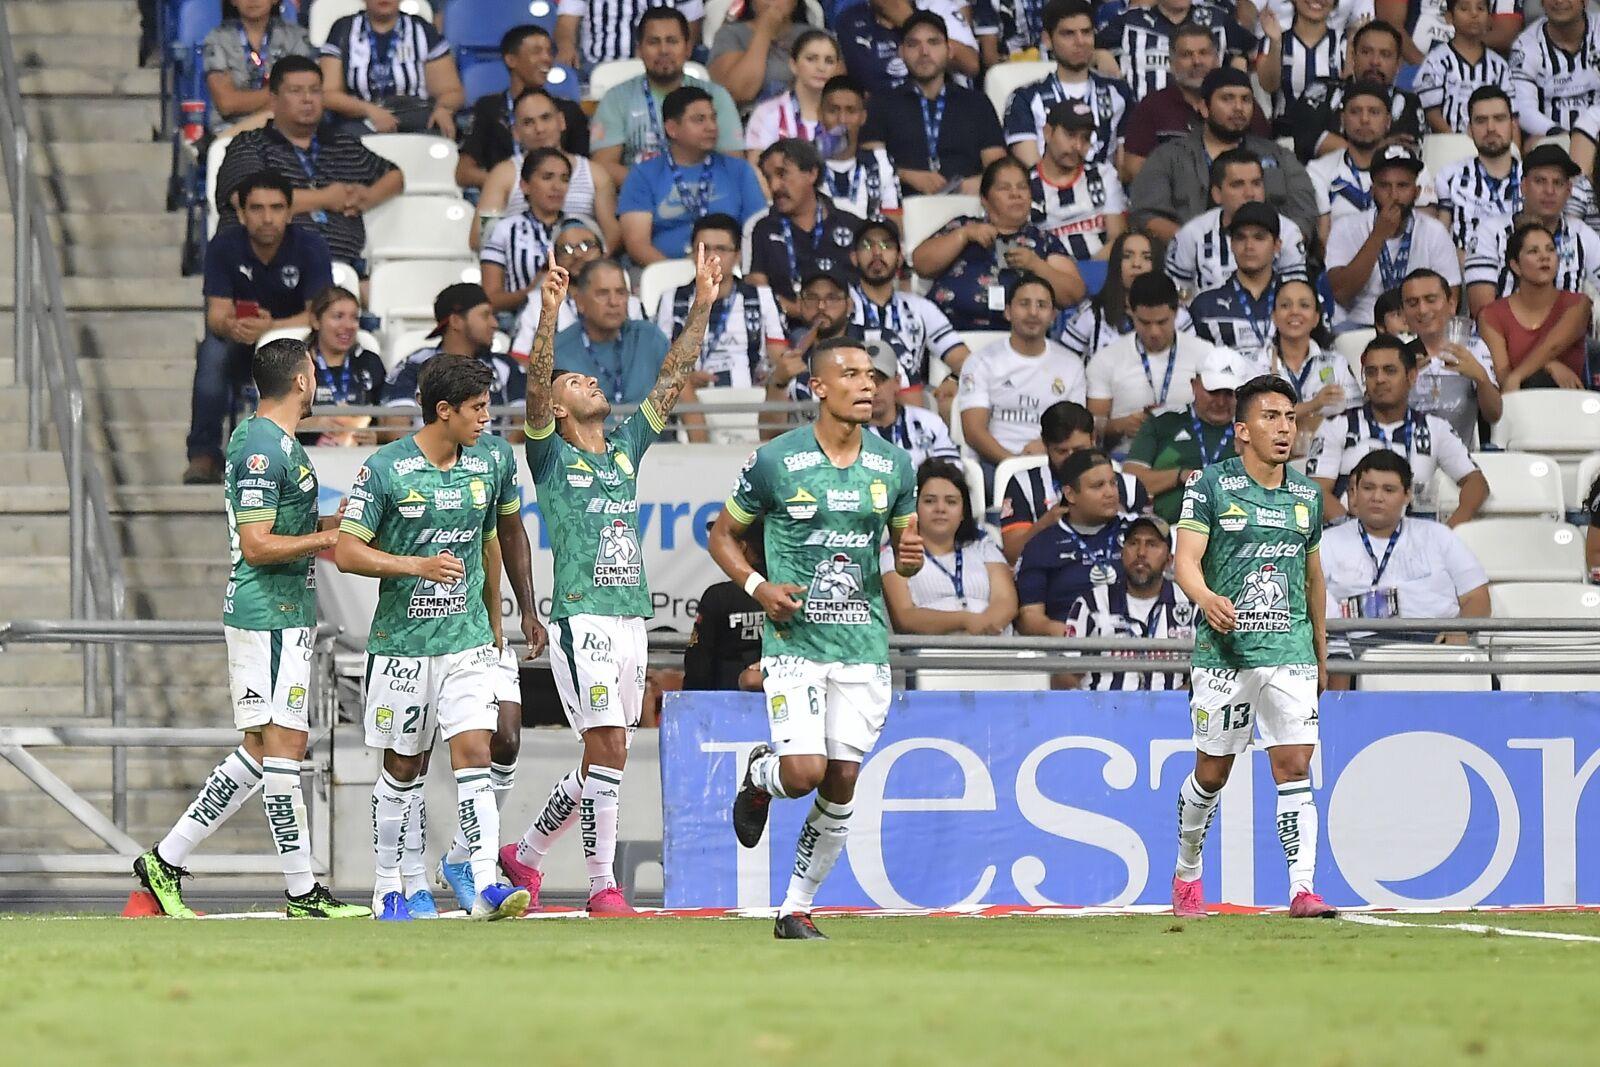 Matchday 5: Chivas look to tame sluggish Esmeraldas in Leon